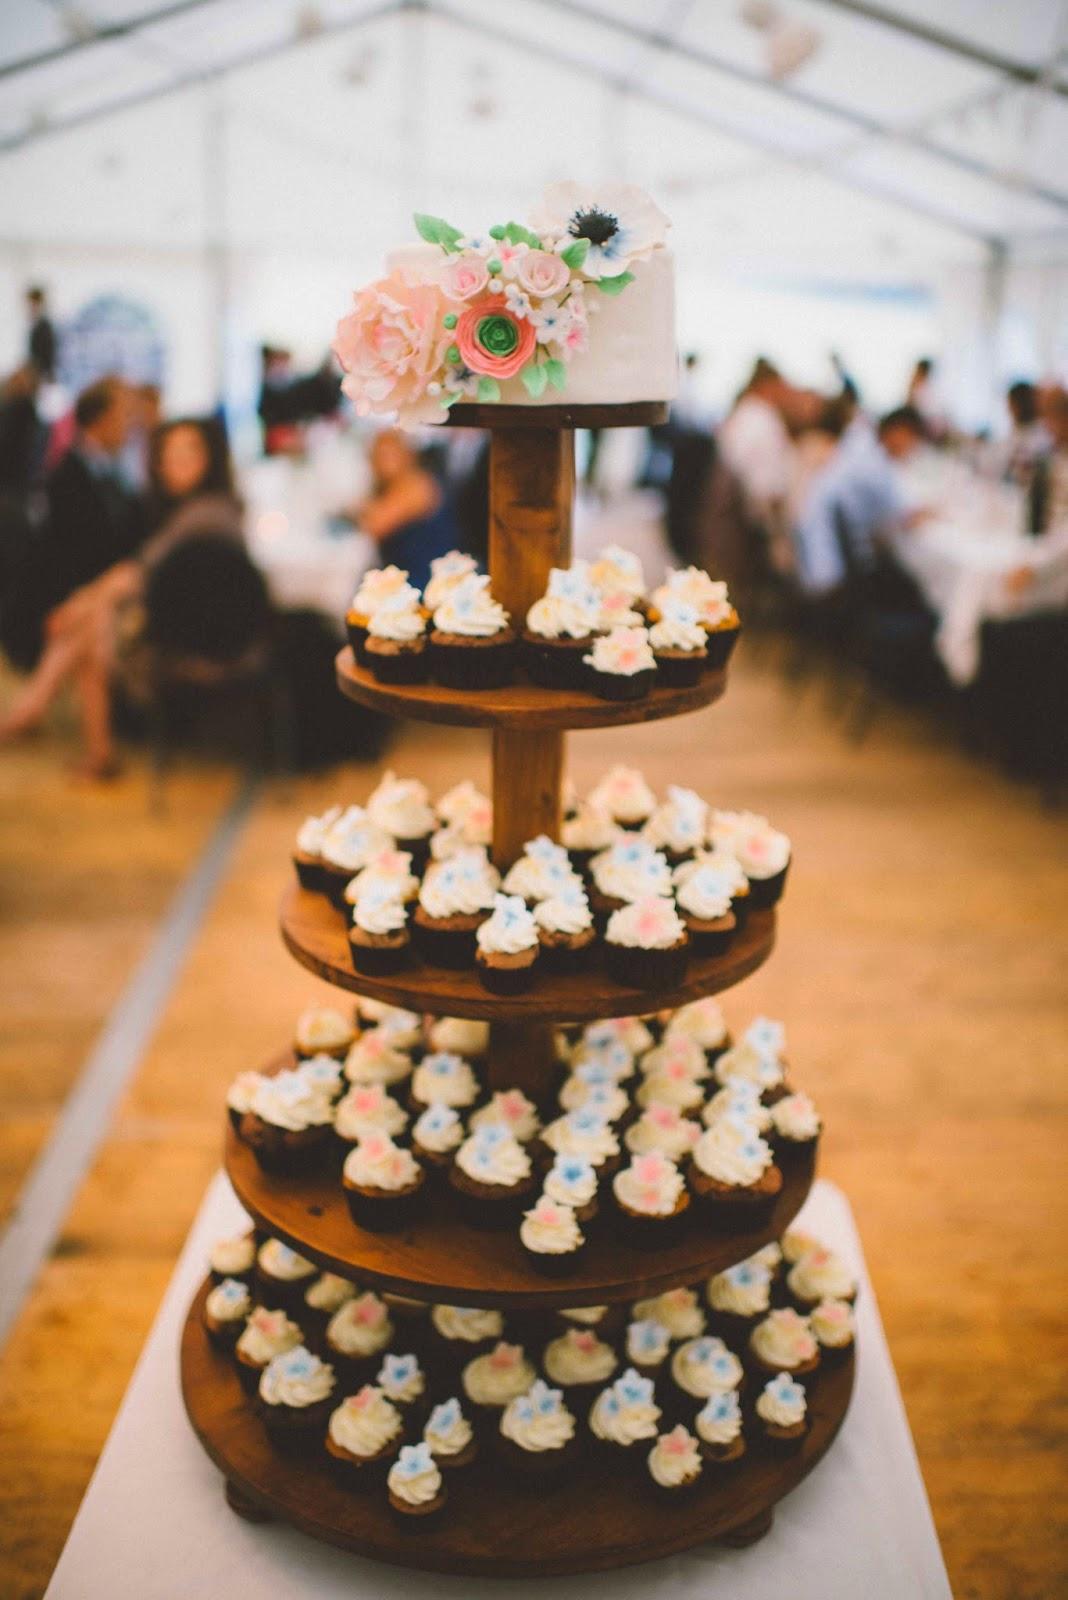 Wedding Cake Wedding Tower Cupcakes Cake Sugar Flowers Baking Carrot Cake Chocolate Cupcakes Swiss Meringue Buttercream Cream Cheese Frosting Wedding Season